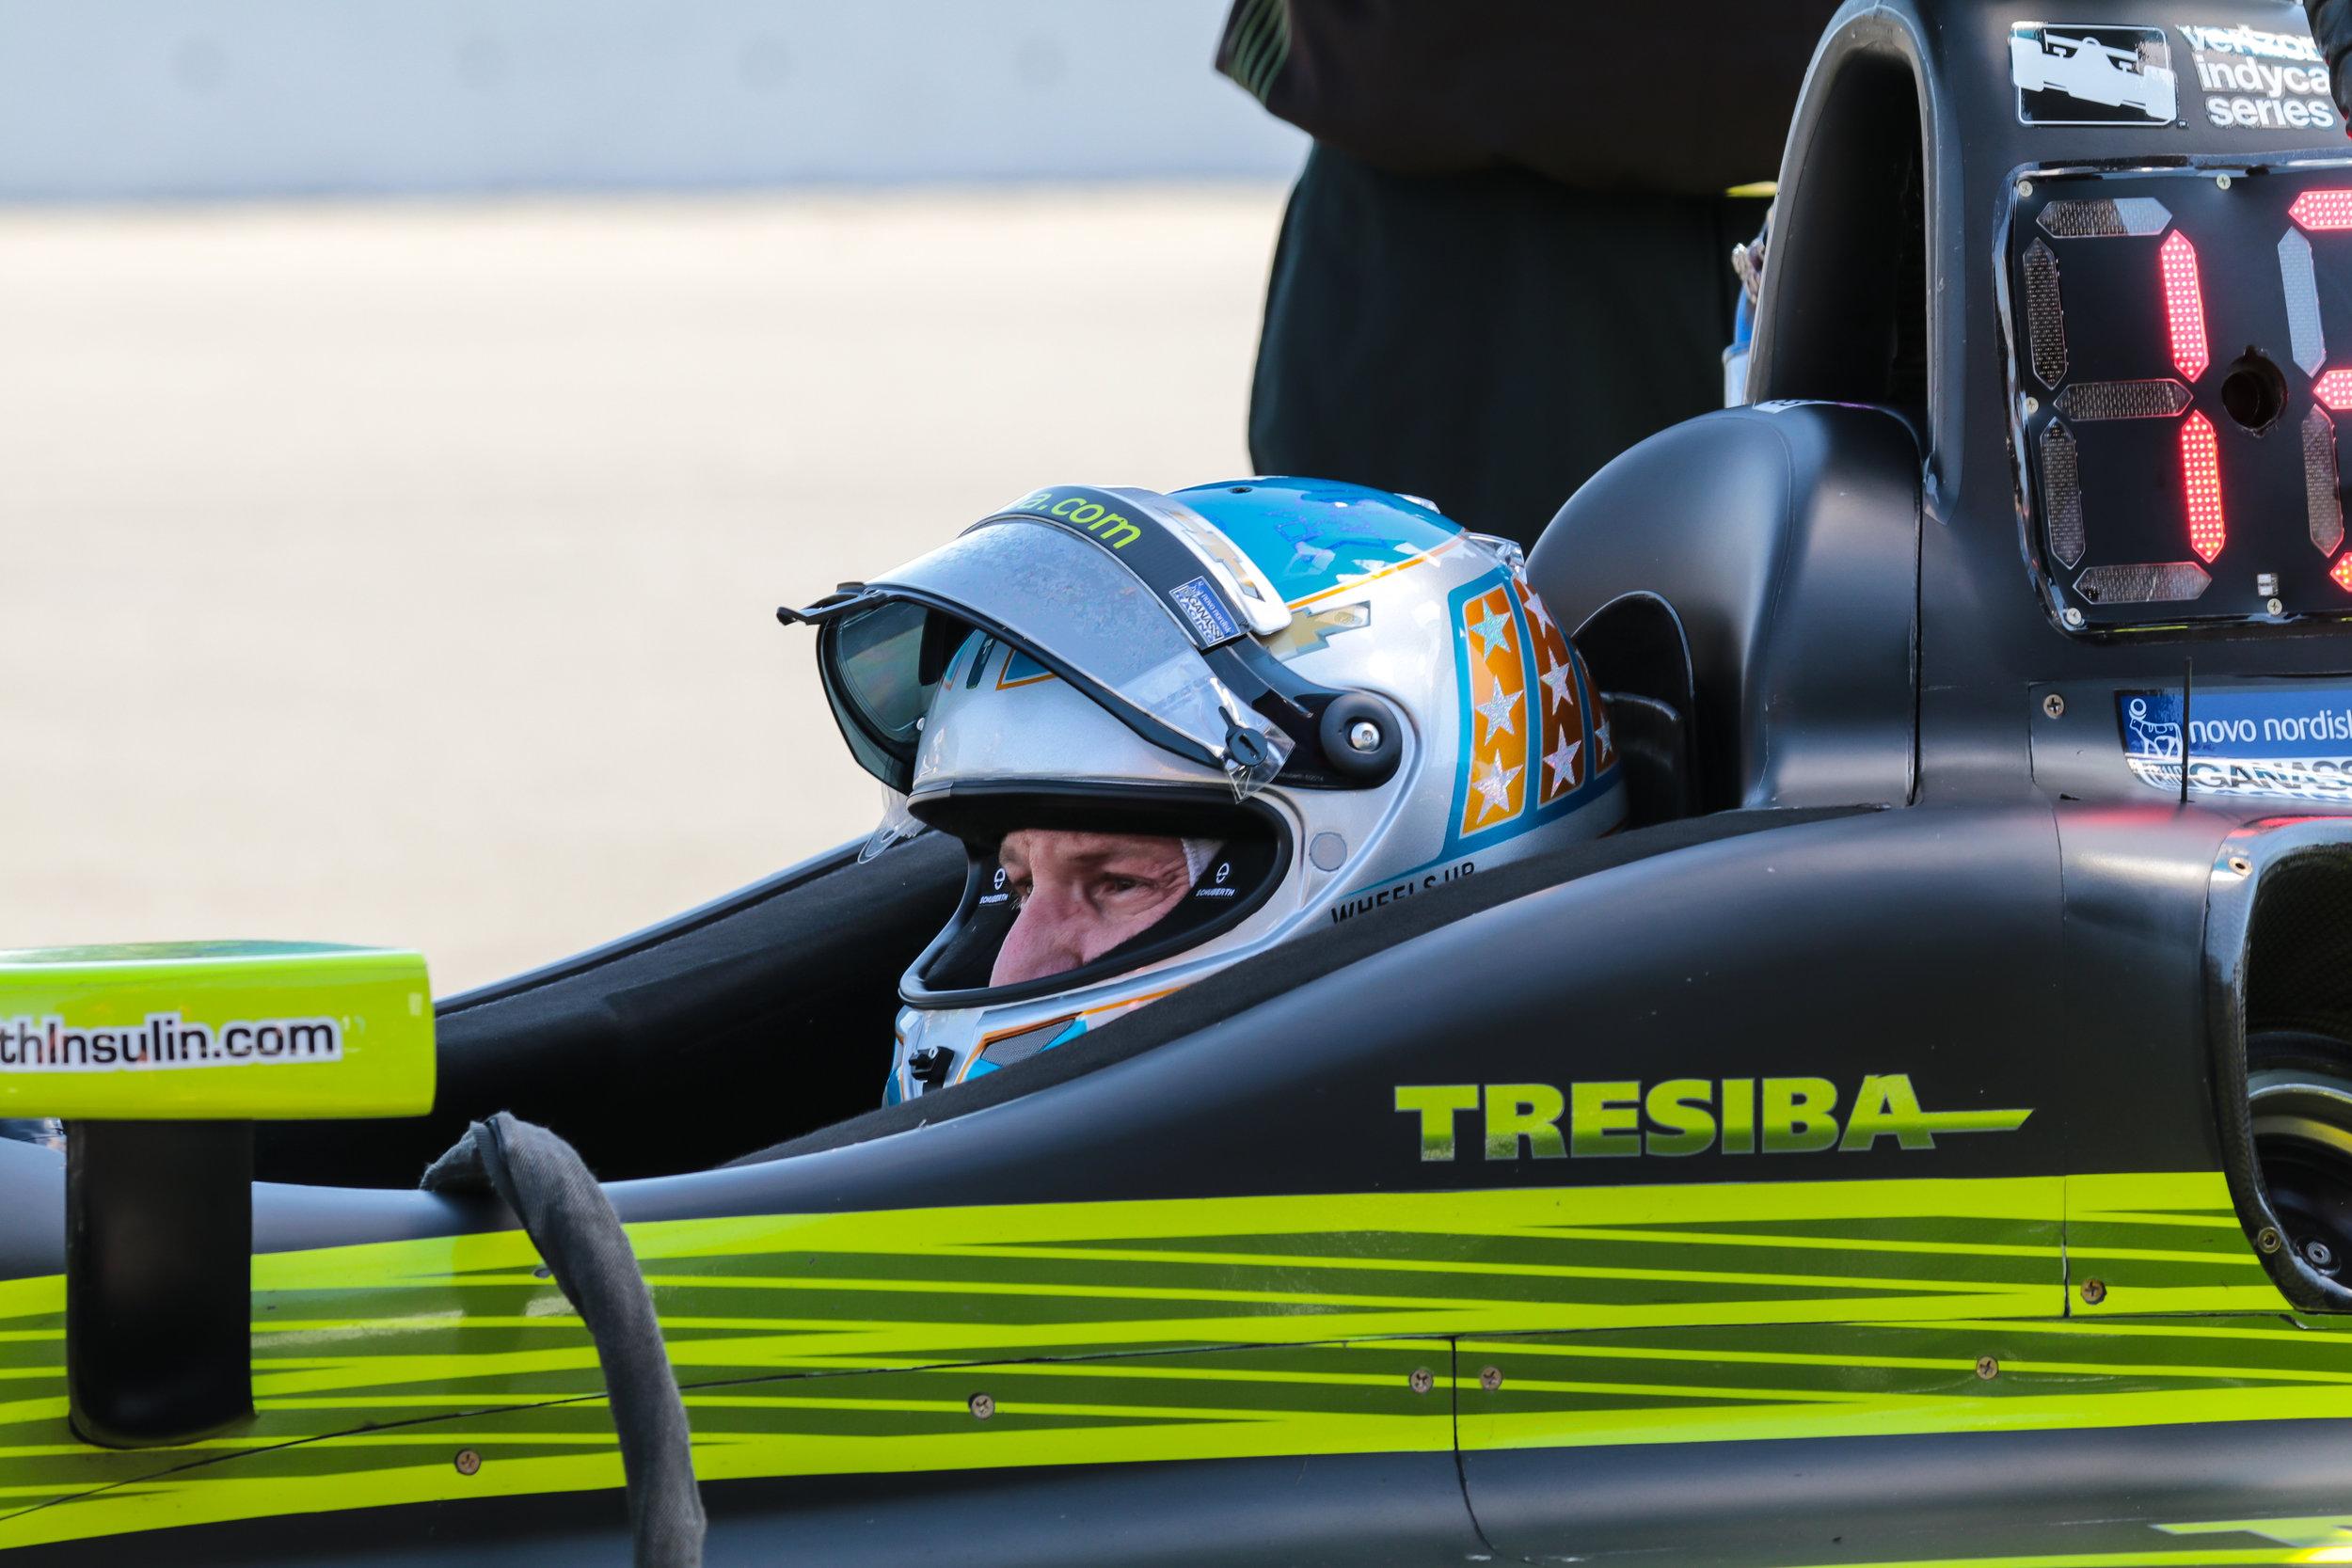 Indy16-2592.jpg